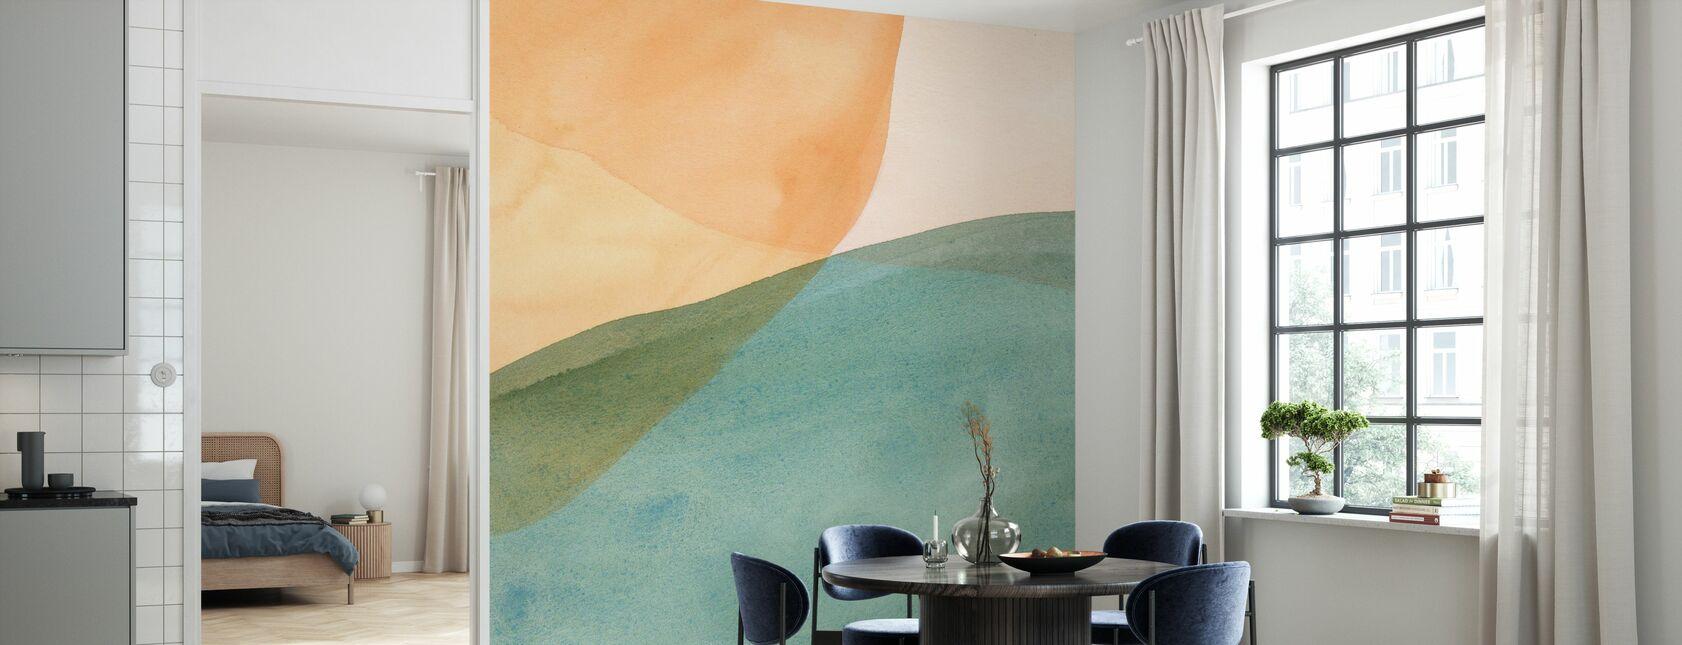 Pastel Color Study - Wallpaper - Kitchen